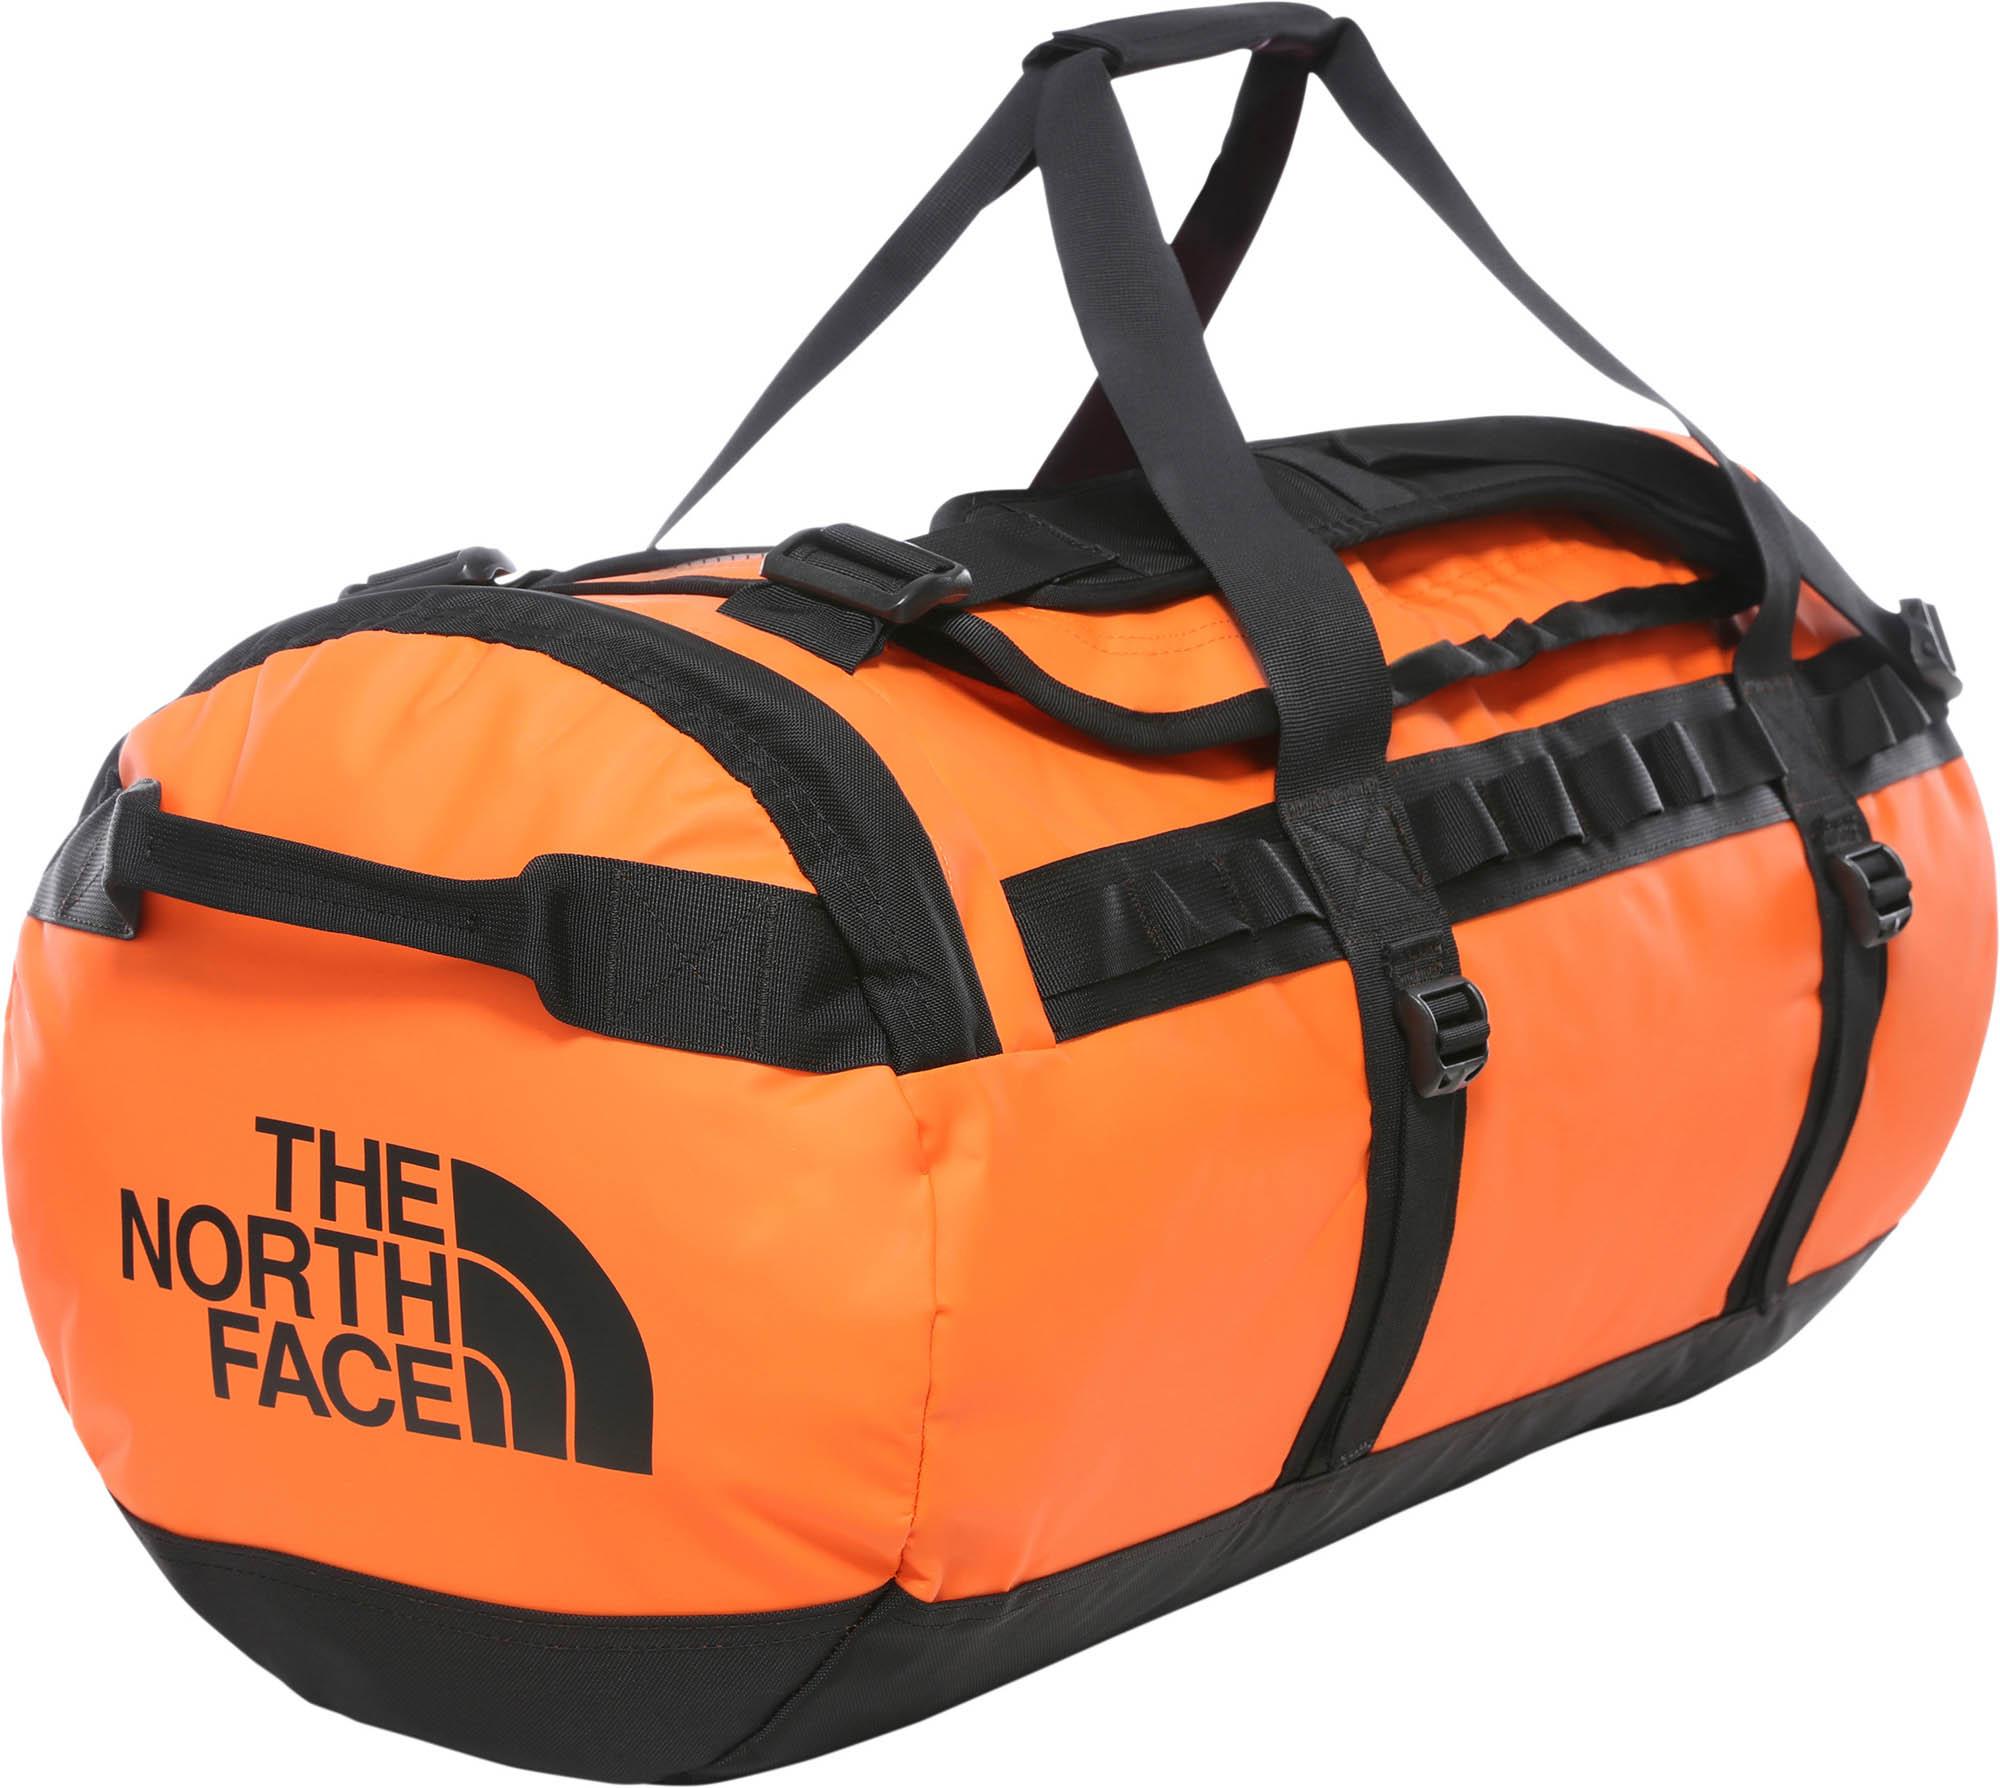 The North Face Сумка The North Face Base Camp Duffel накидка на рюкзак the north face the north face pack rain cover красный l